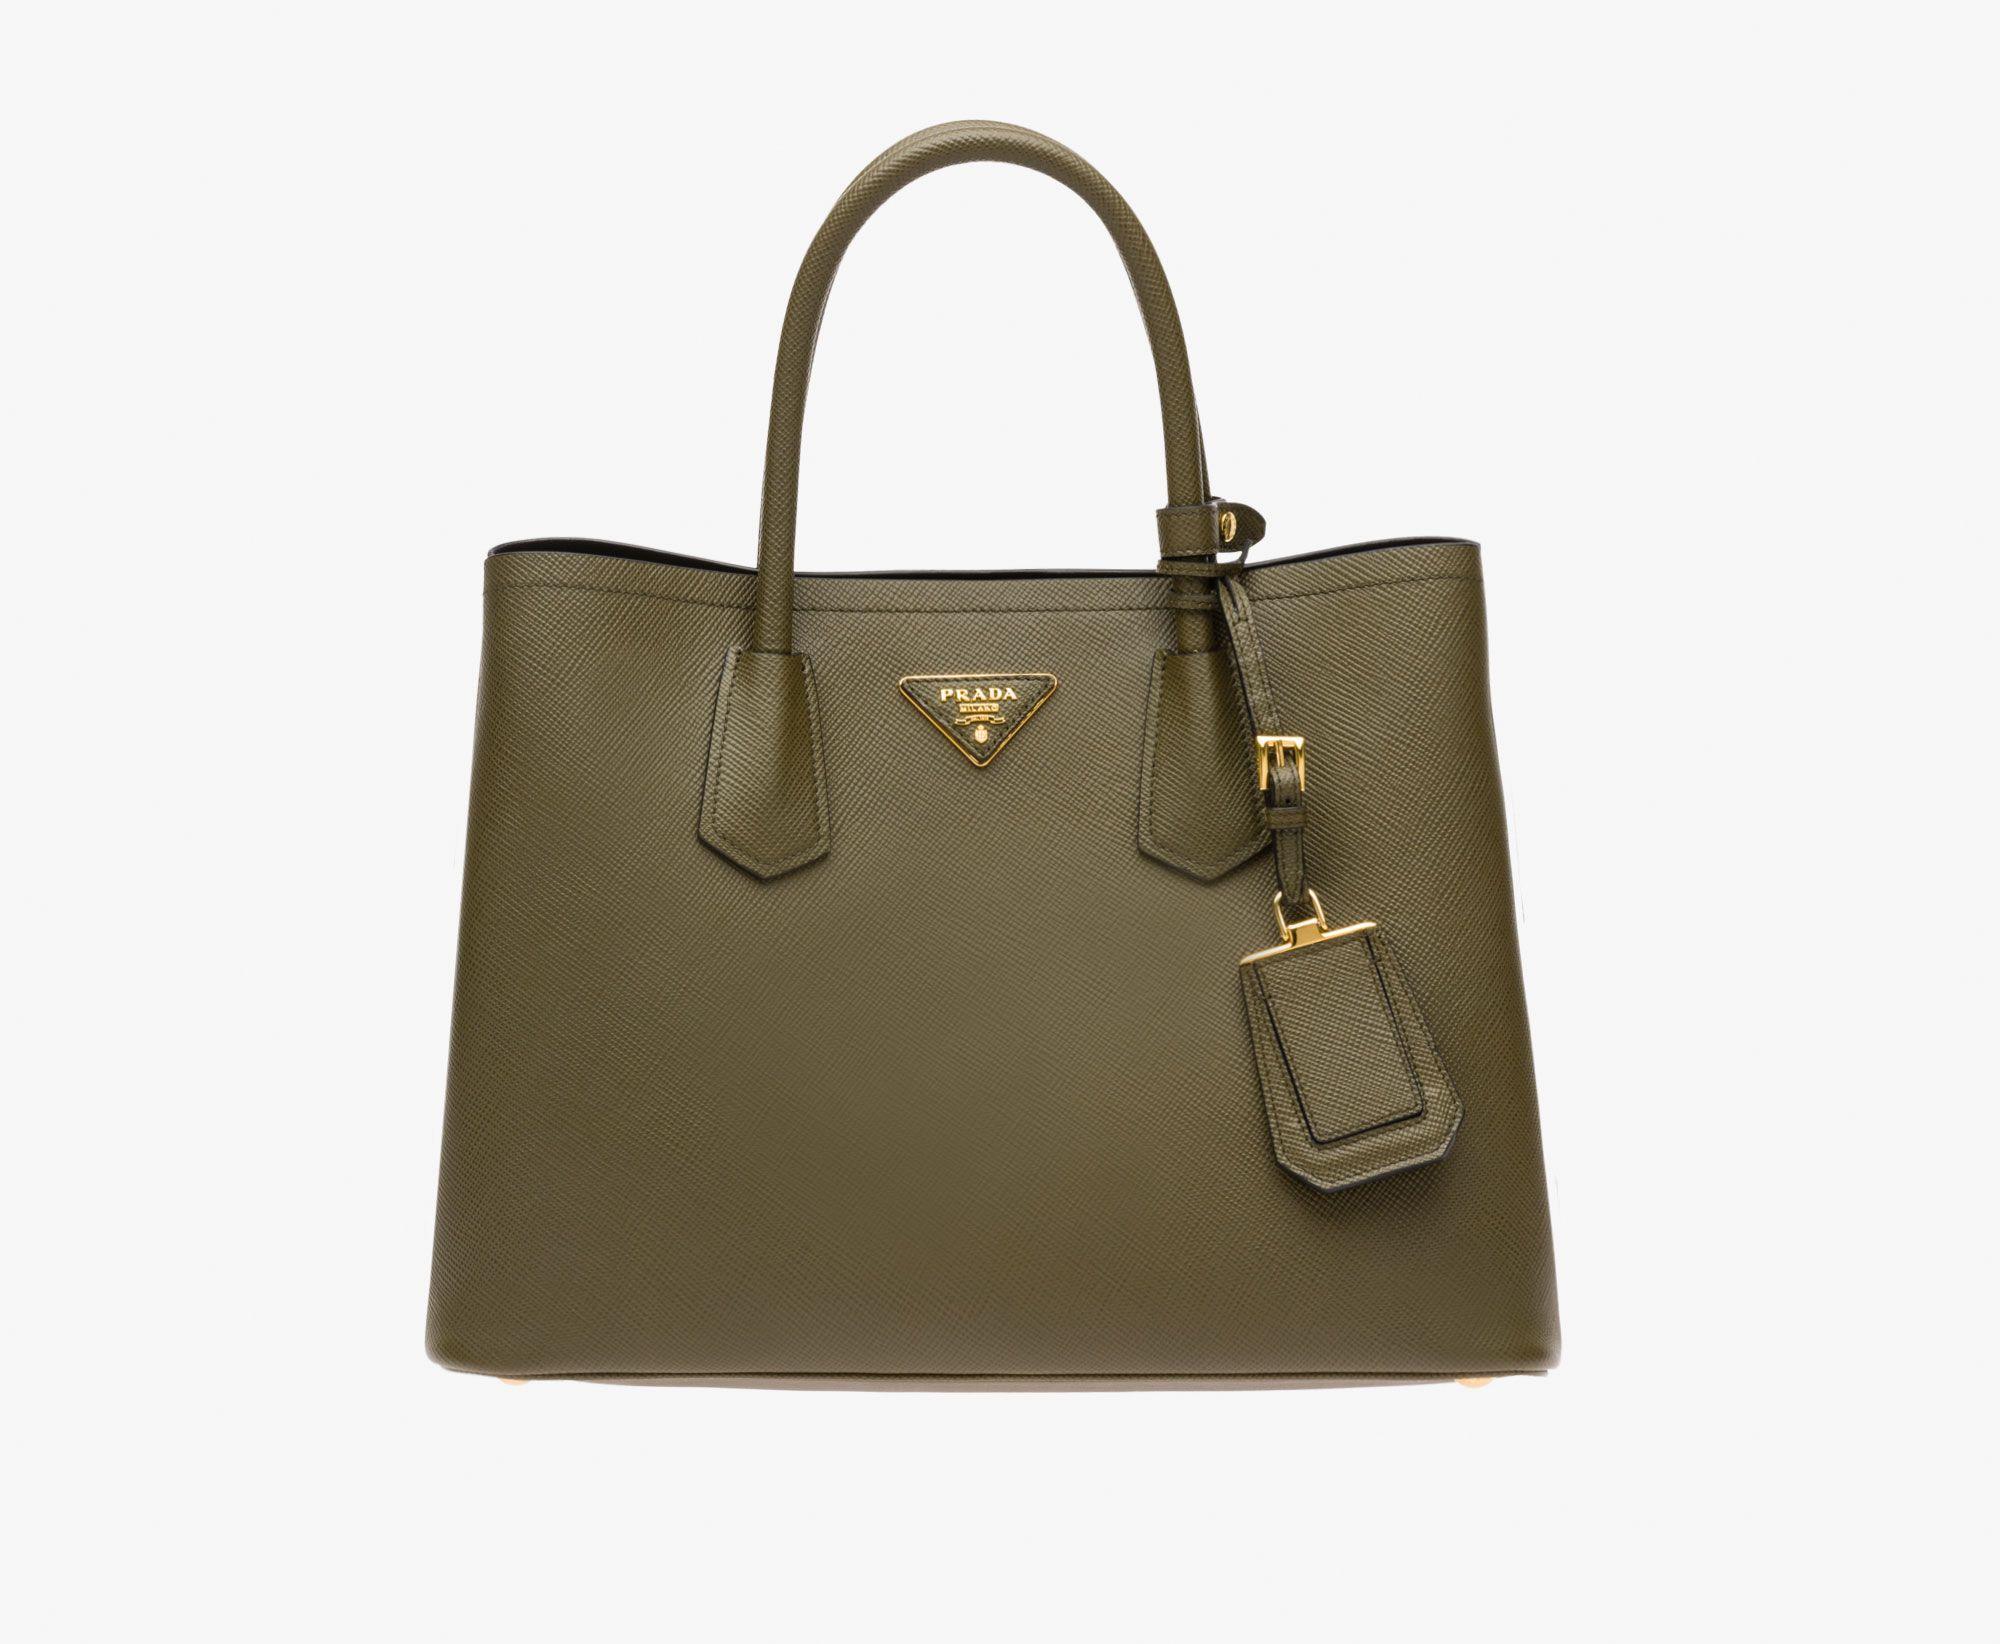 f9b1865e4fec prada deerskin bag price, prada cahier notebook shoulder bag limited ...